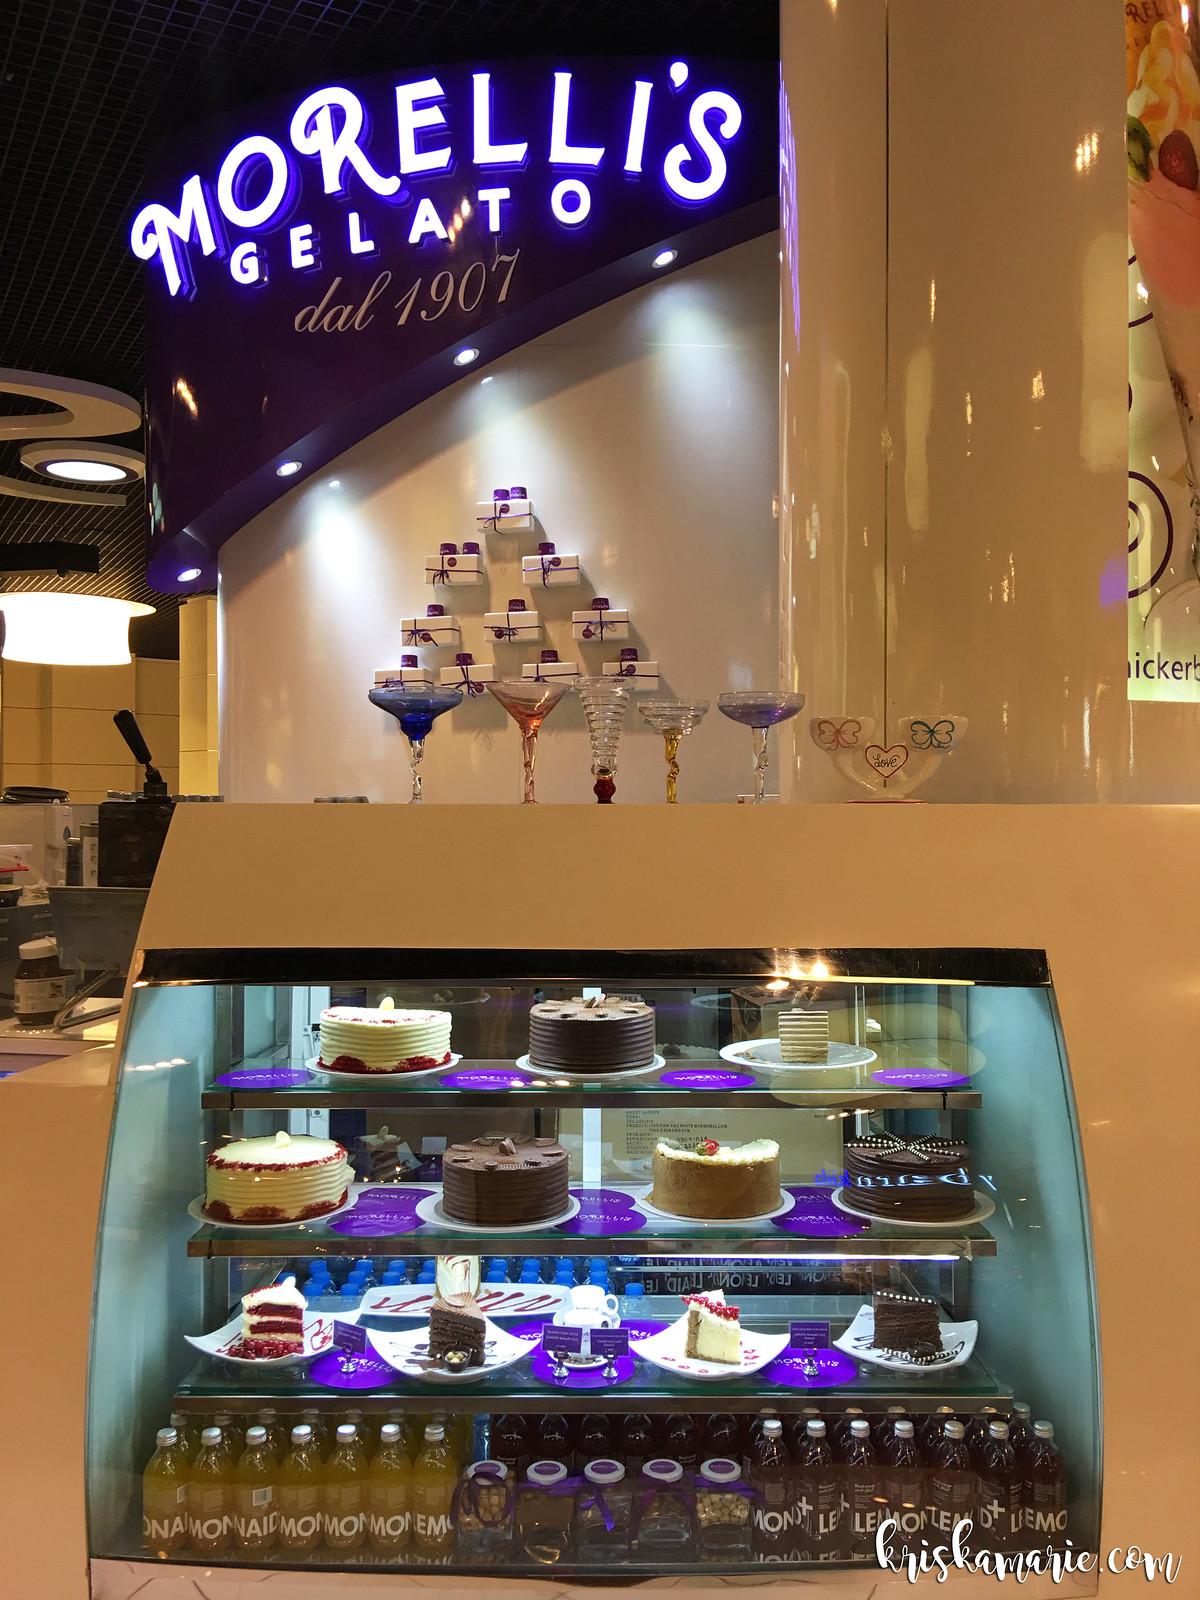 Birthday Desserts at Morelli's Gelato